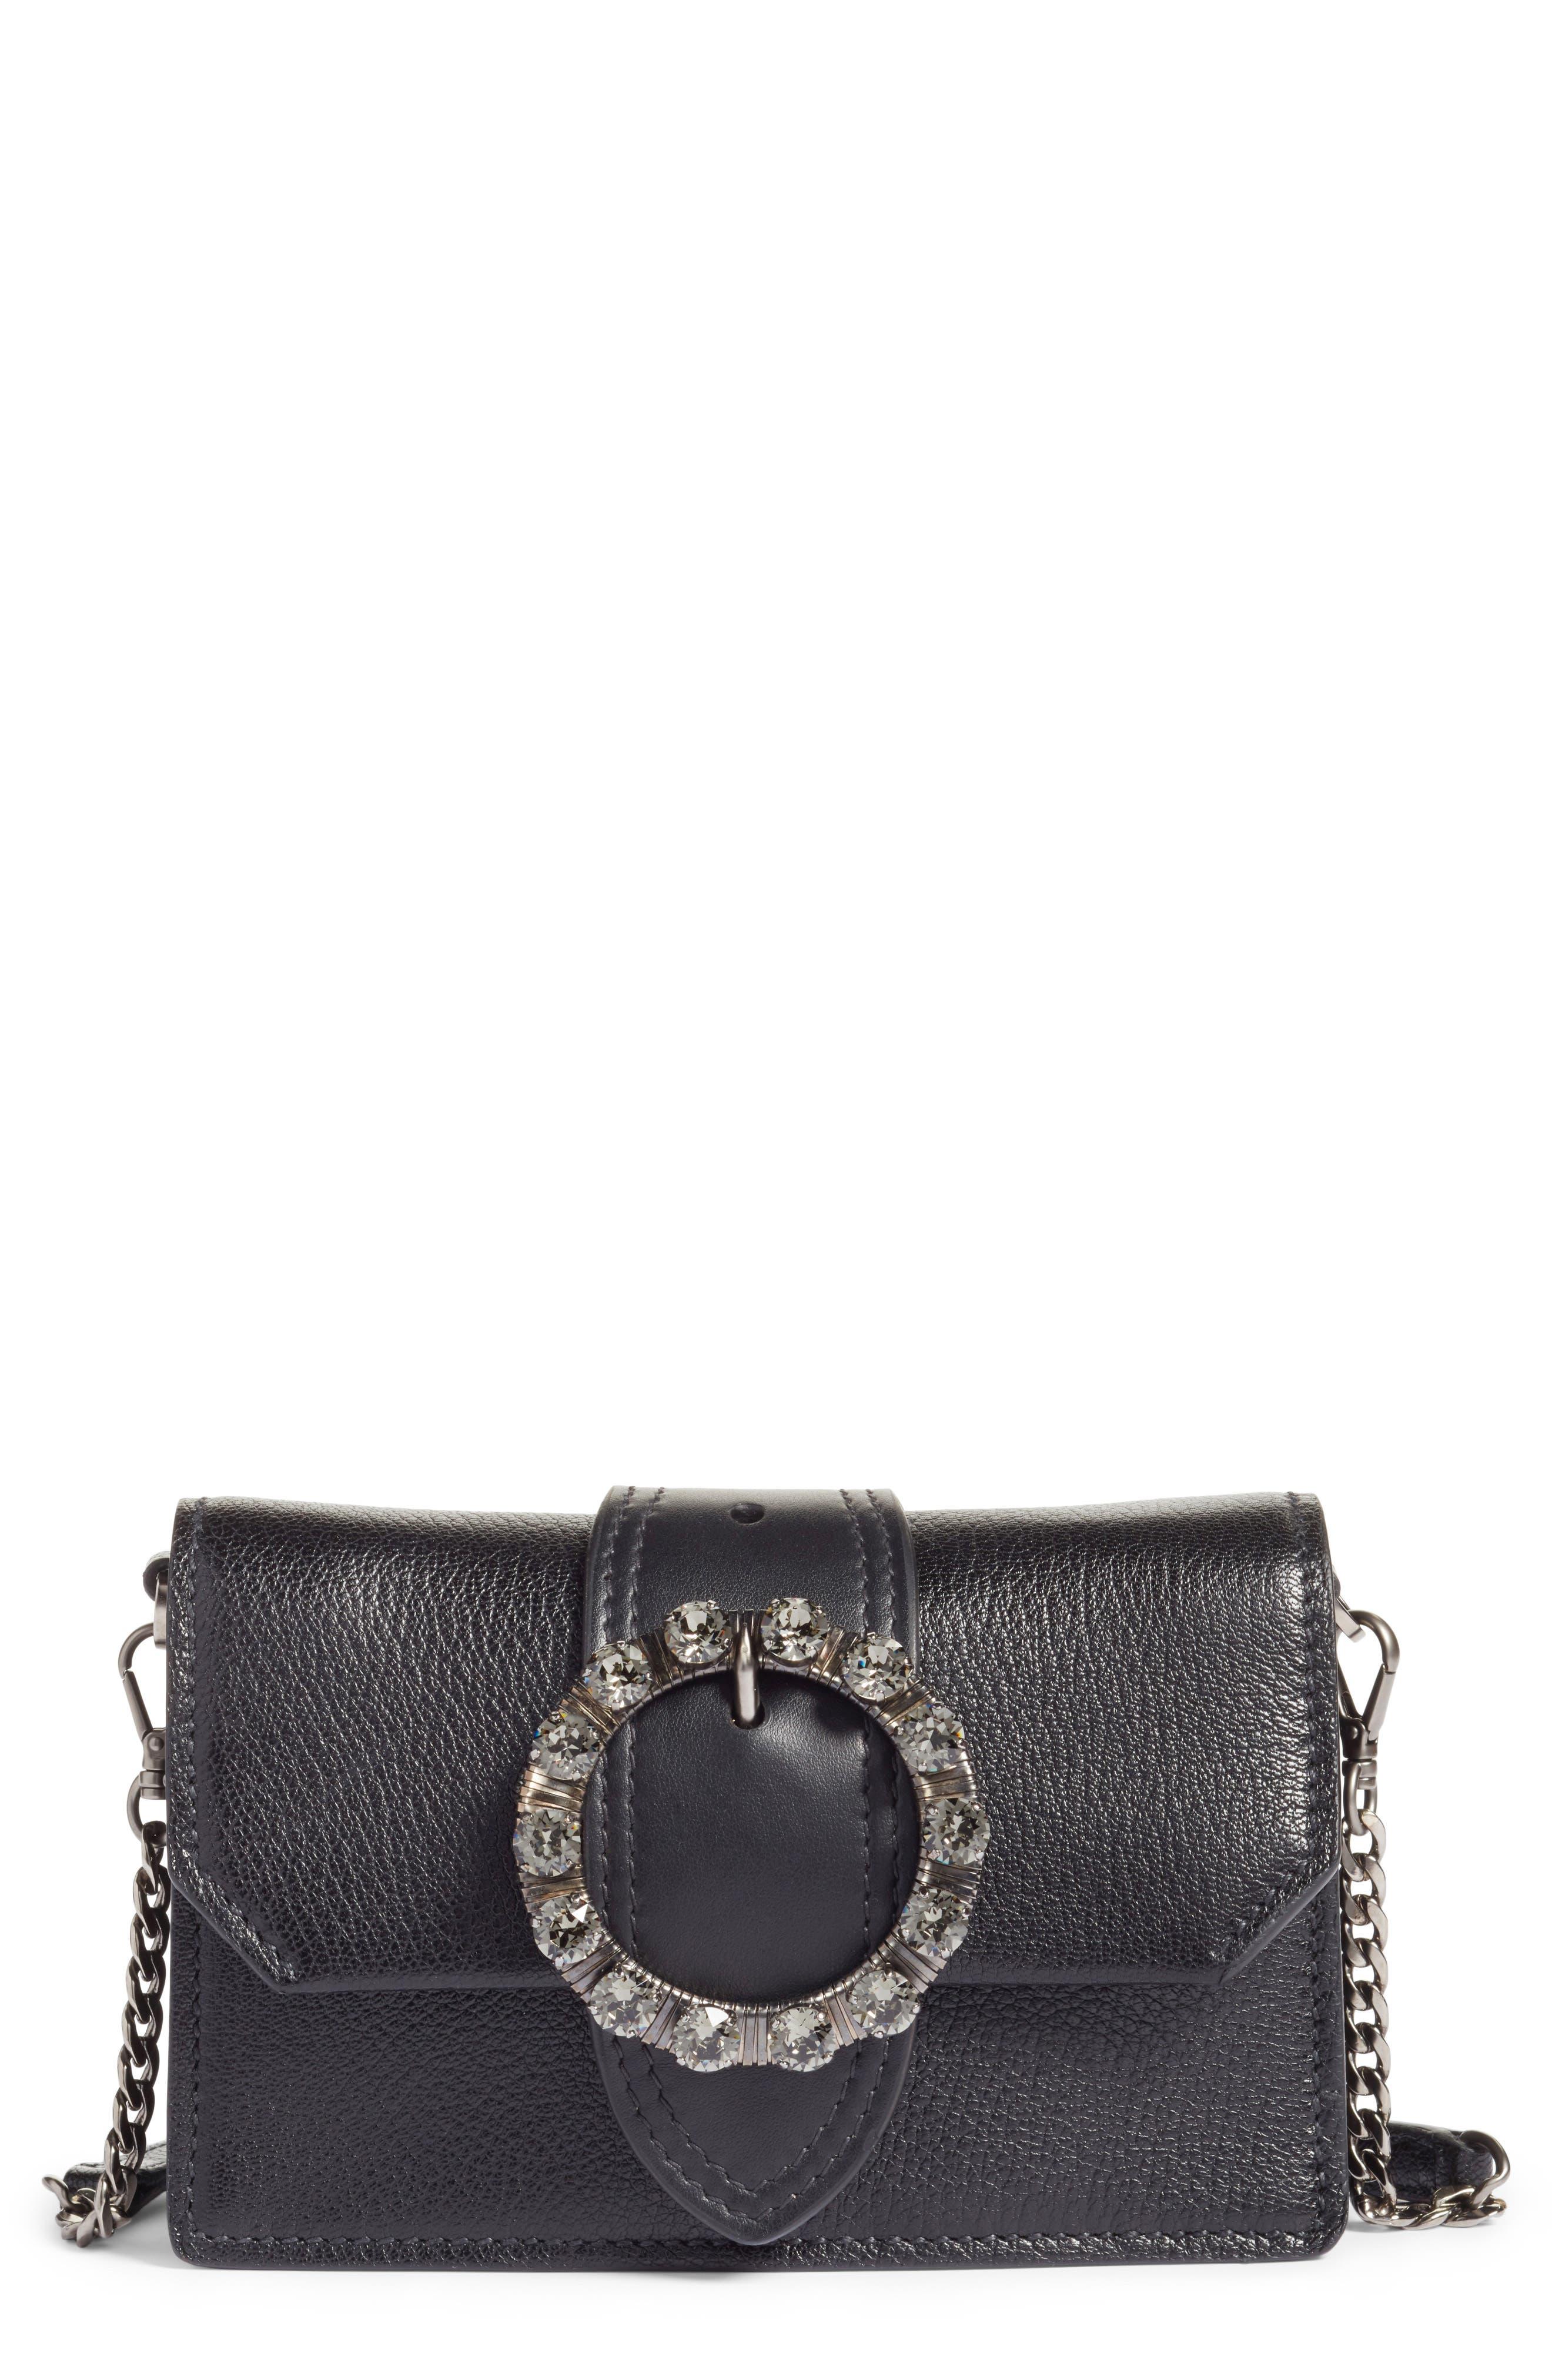 Lady Madras Crystal Embellished Leather Crossbody Bag,                         Main,                         color, Nero 1